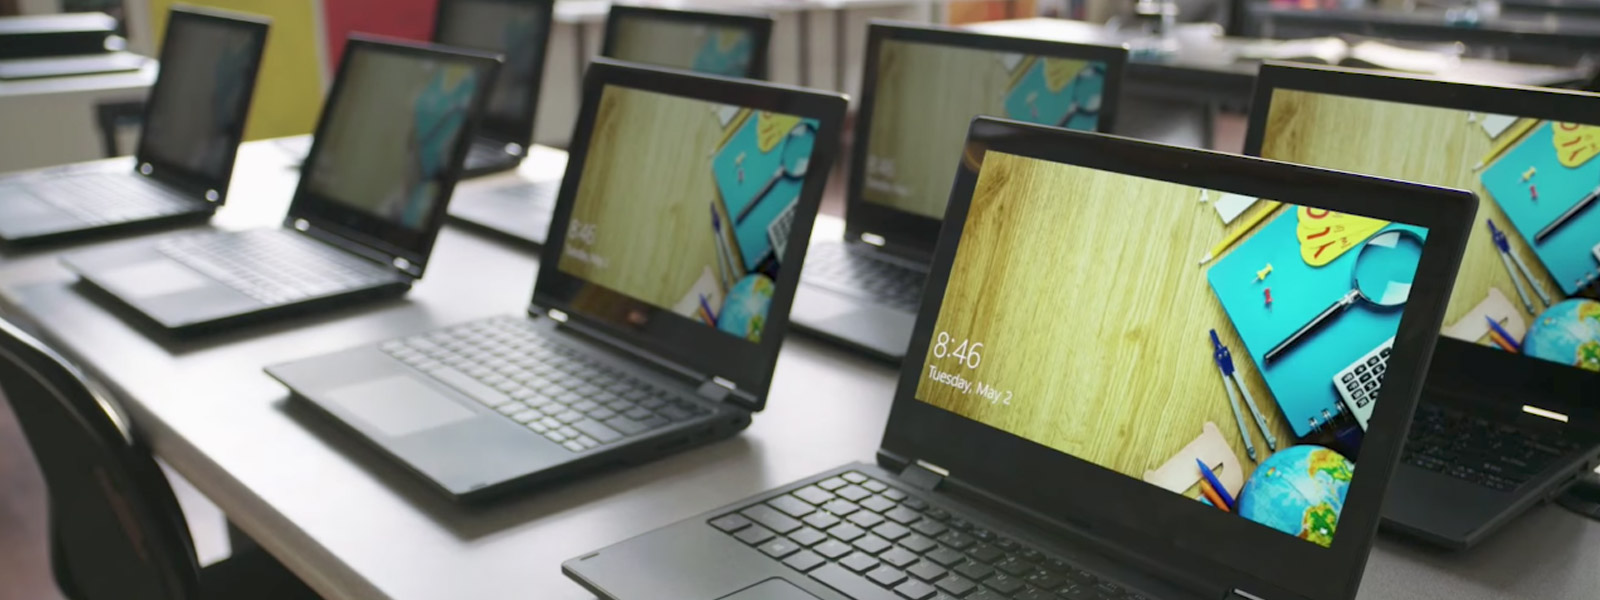 PCs im Klassenzimmer